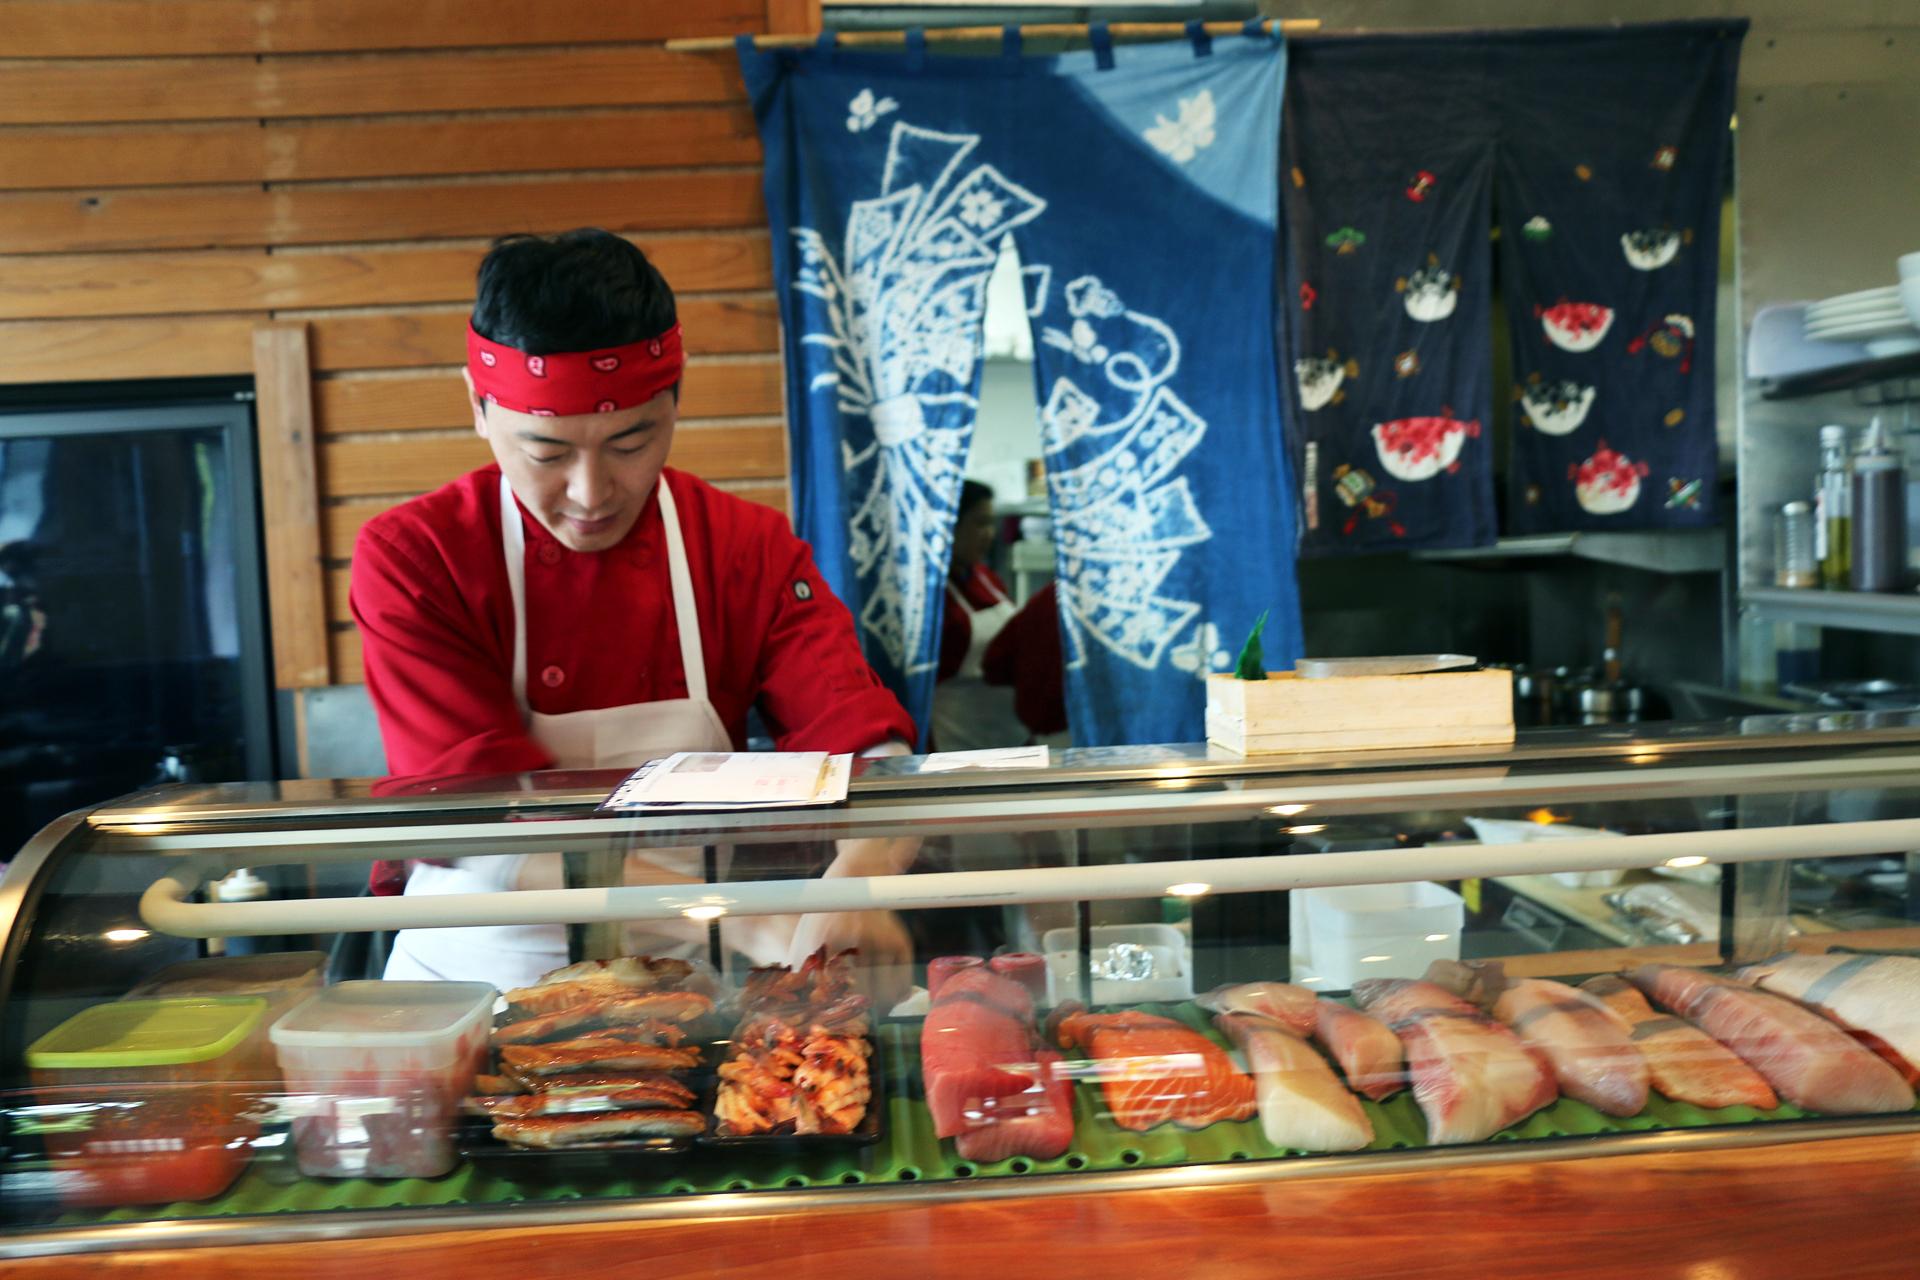 Kiku's small, colorful sushi bar.